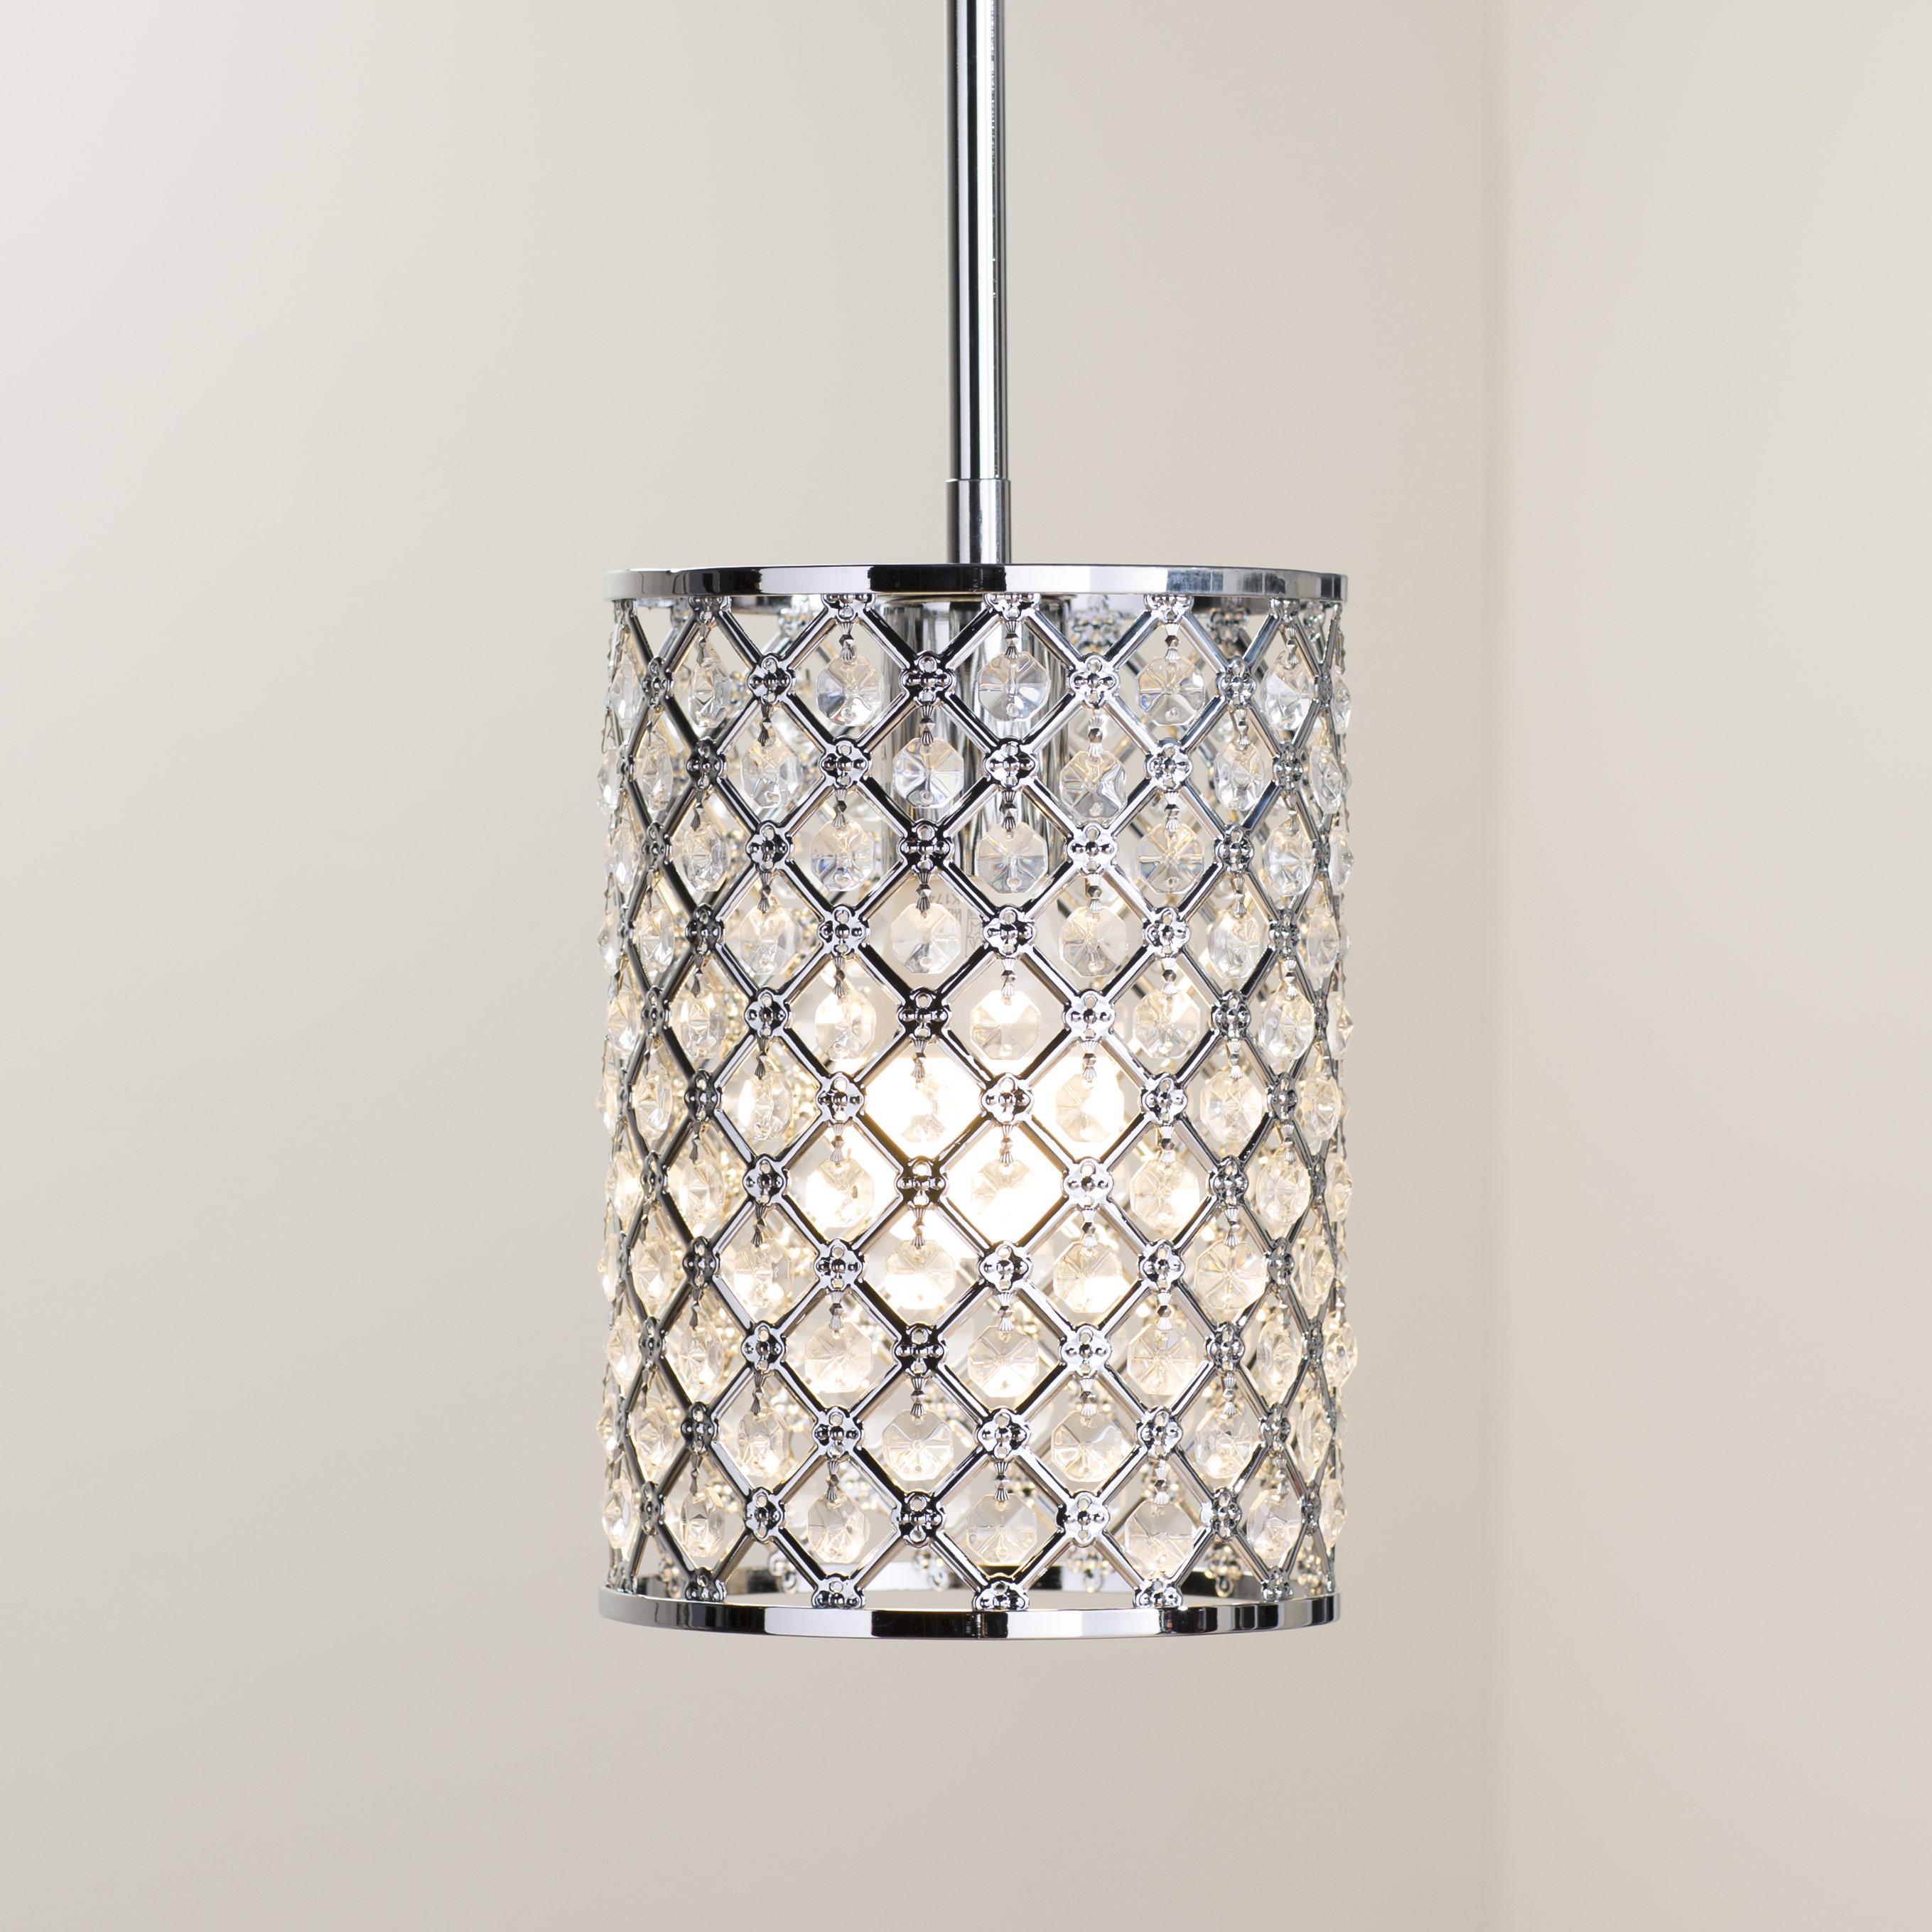 Araujo 1 Light Crystal Pendant In Hurst 1 Light Single Cylinder Pendants (View 9 of 30)